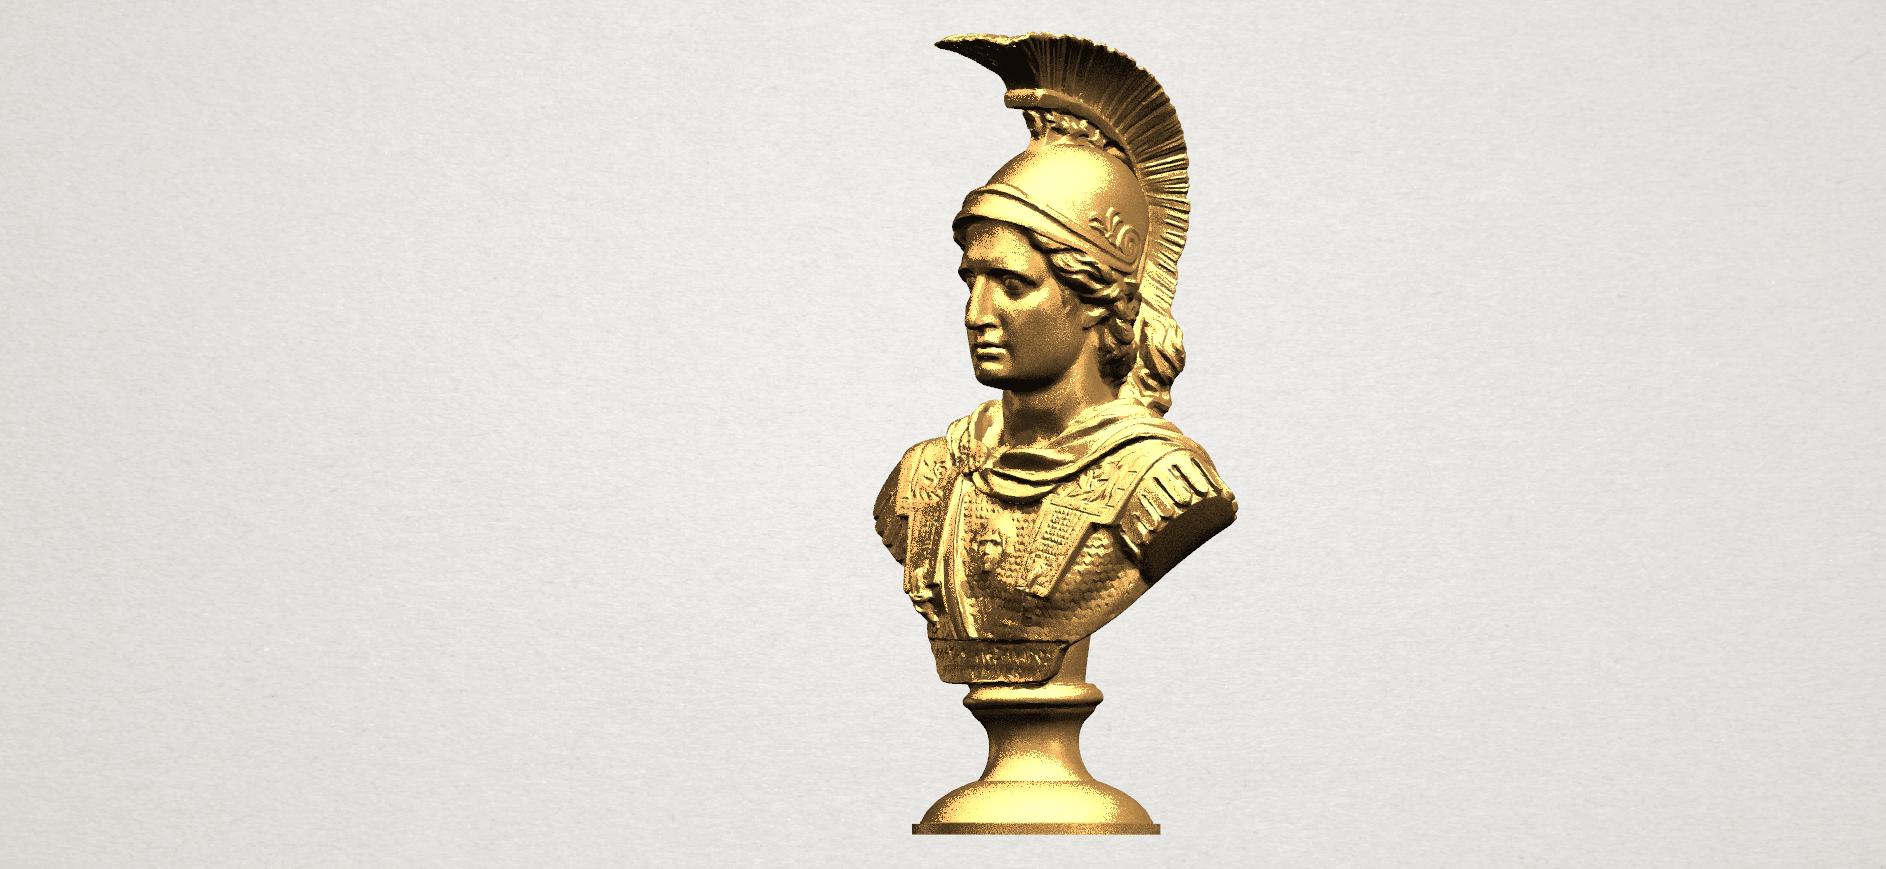 Alexander A03.png Download free STL file Alexander • 3D printer object, GeorgesNikkei